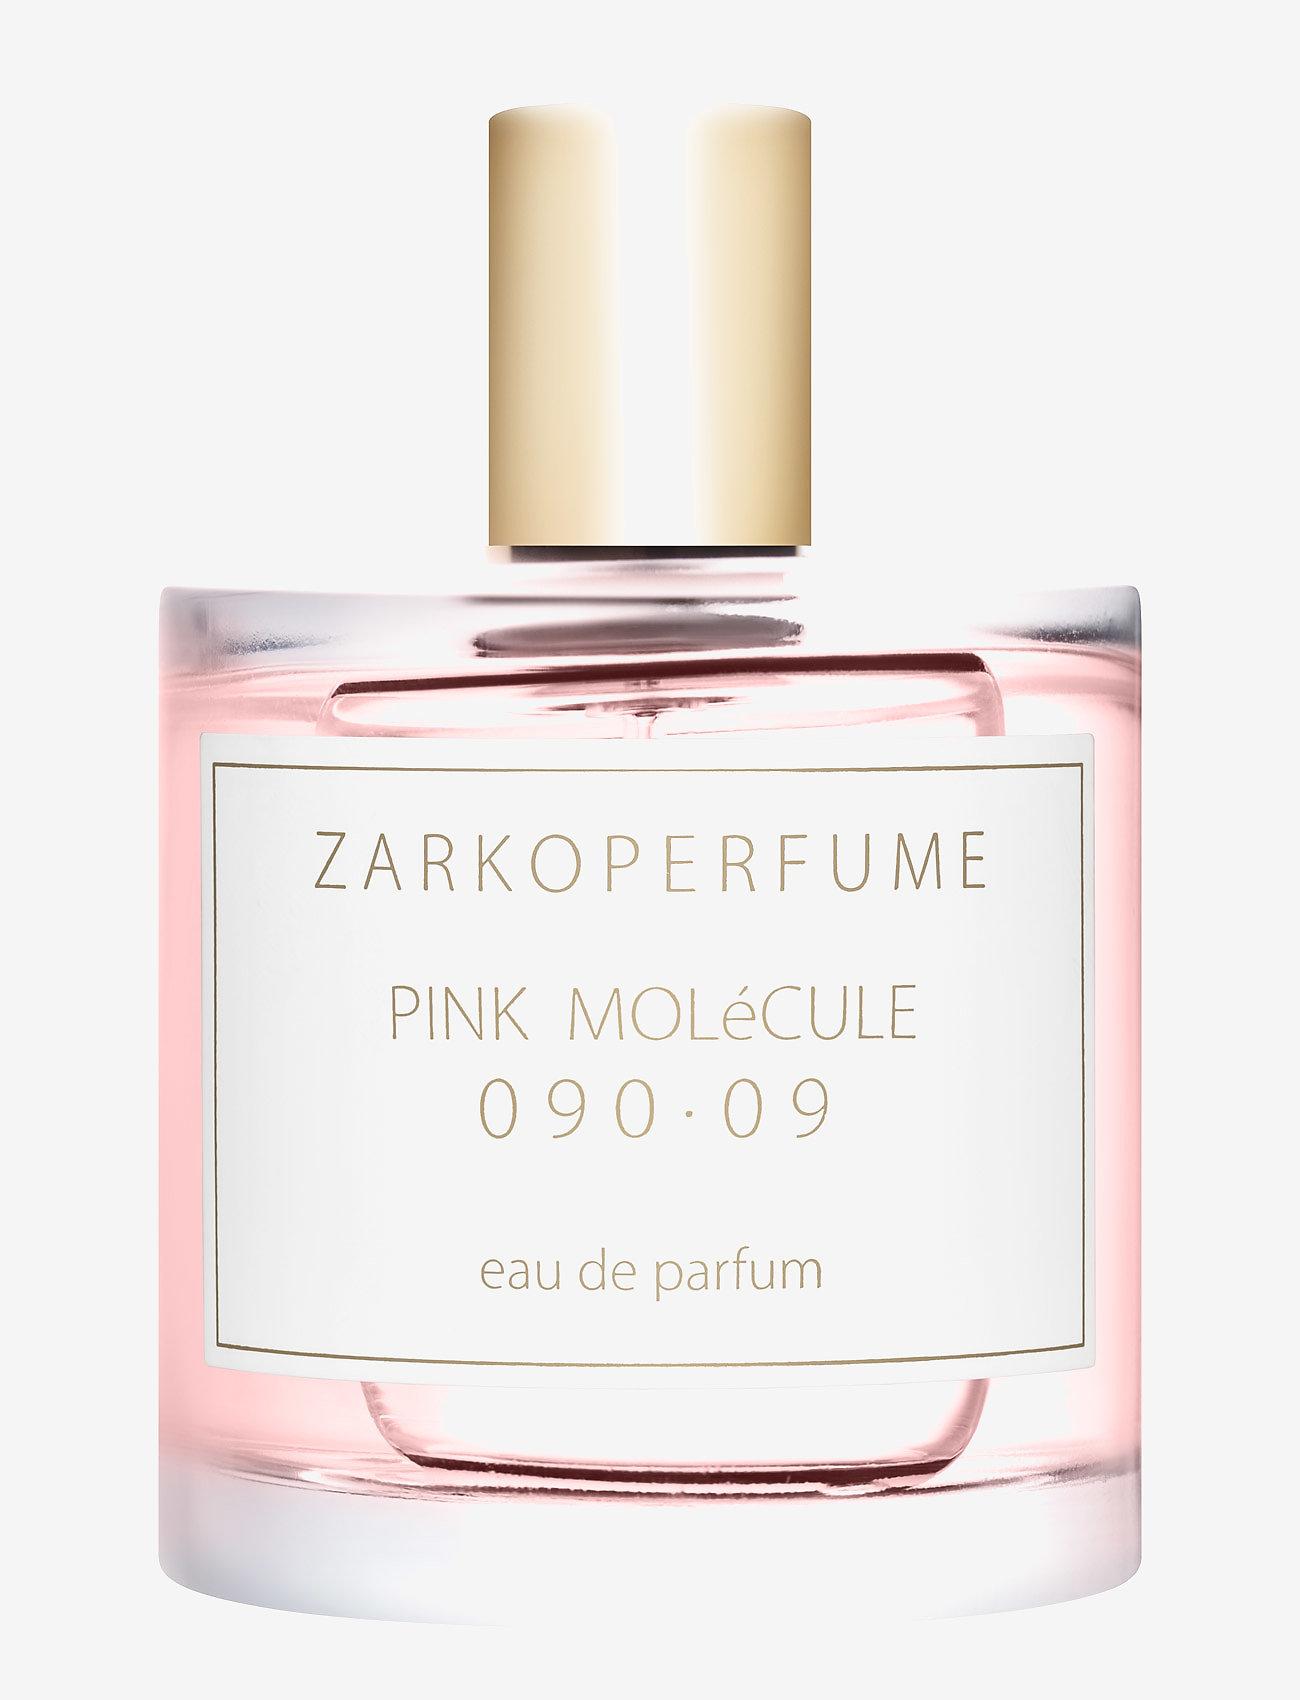 Zarkoperfume - Pink Molecule 090.09 EDP - parfym - clear - 0